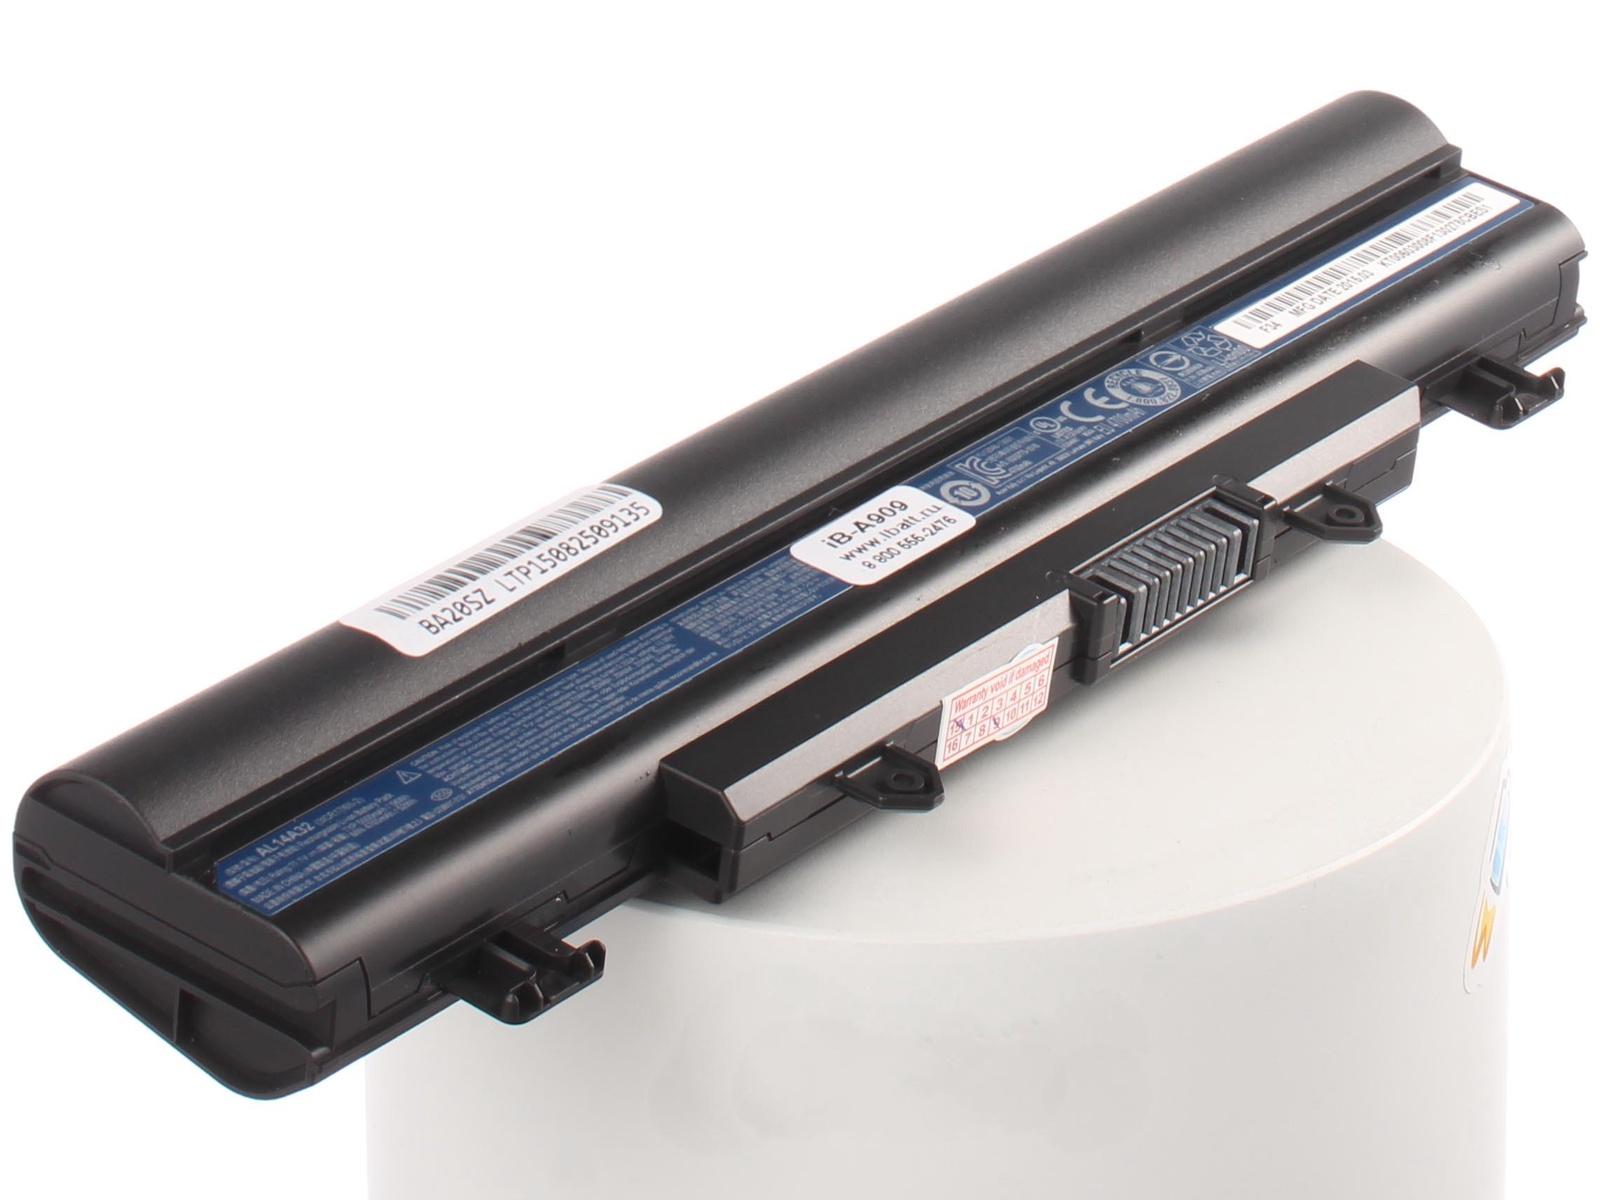 Аккумулятор для ноутбука iBatt для Acer TravelMate P276-MG, Aspire E5-421, Aspire E5-511G-P02E, Aspire E5-521G-841X, Aspire E5-571-36HN, Aspire E5-571-38UR, Aspire E5-571G-31VE, Aspire E5-571G-37JX, Aspire E5-571G-50D4